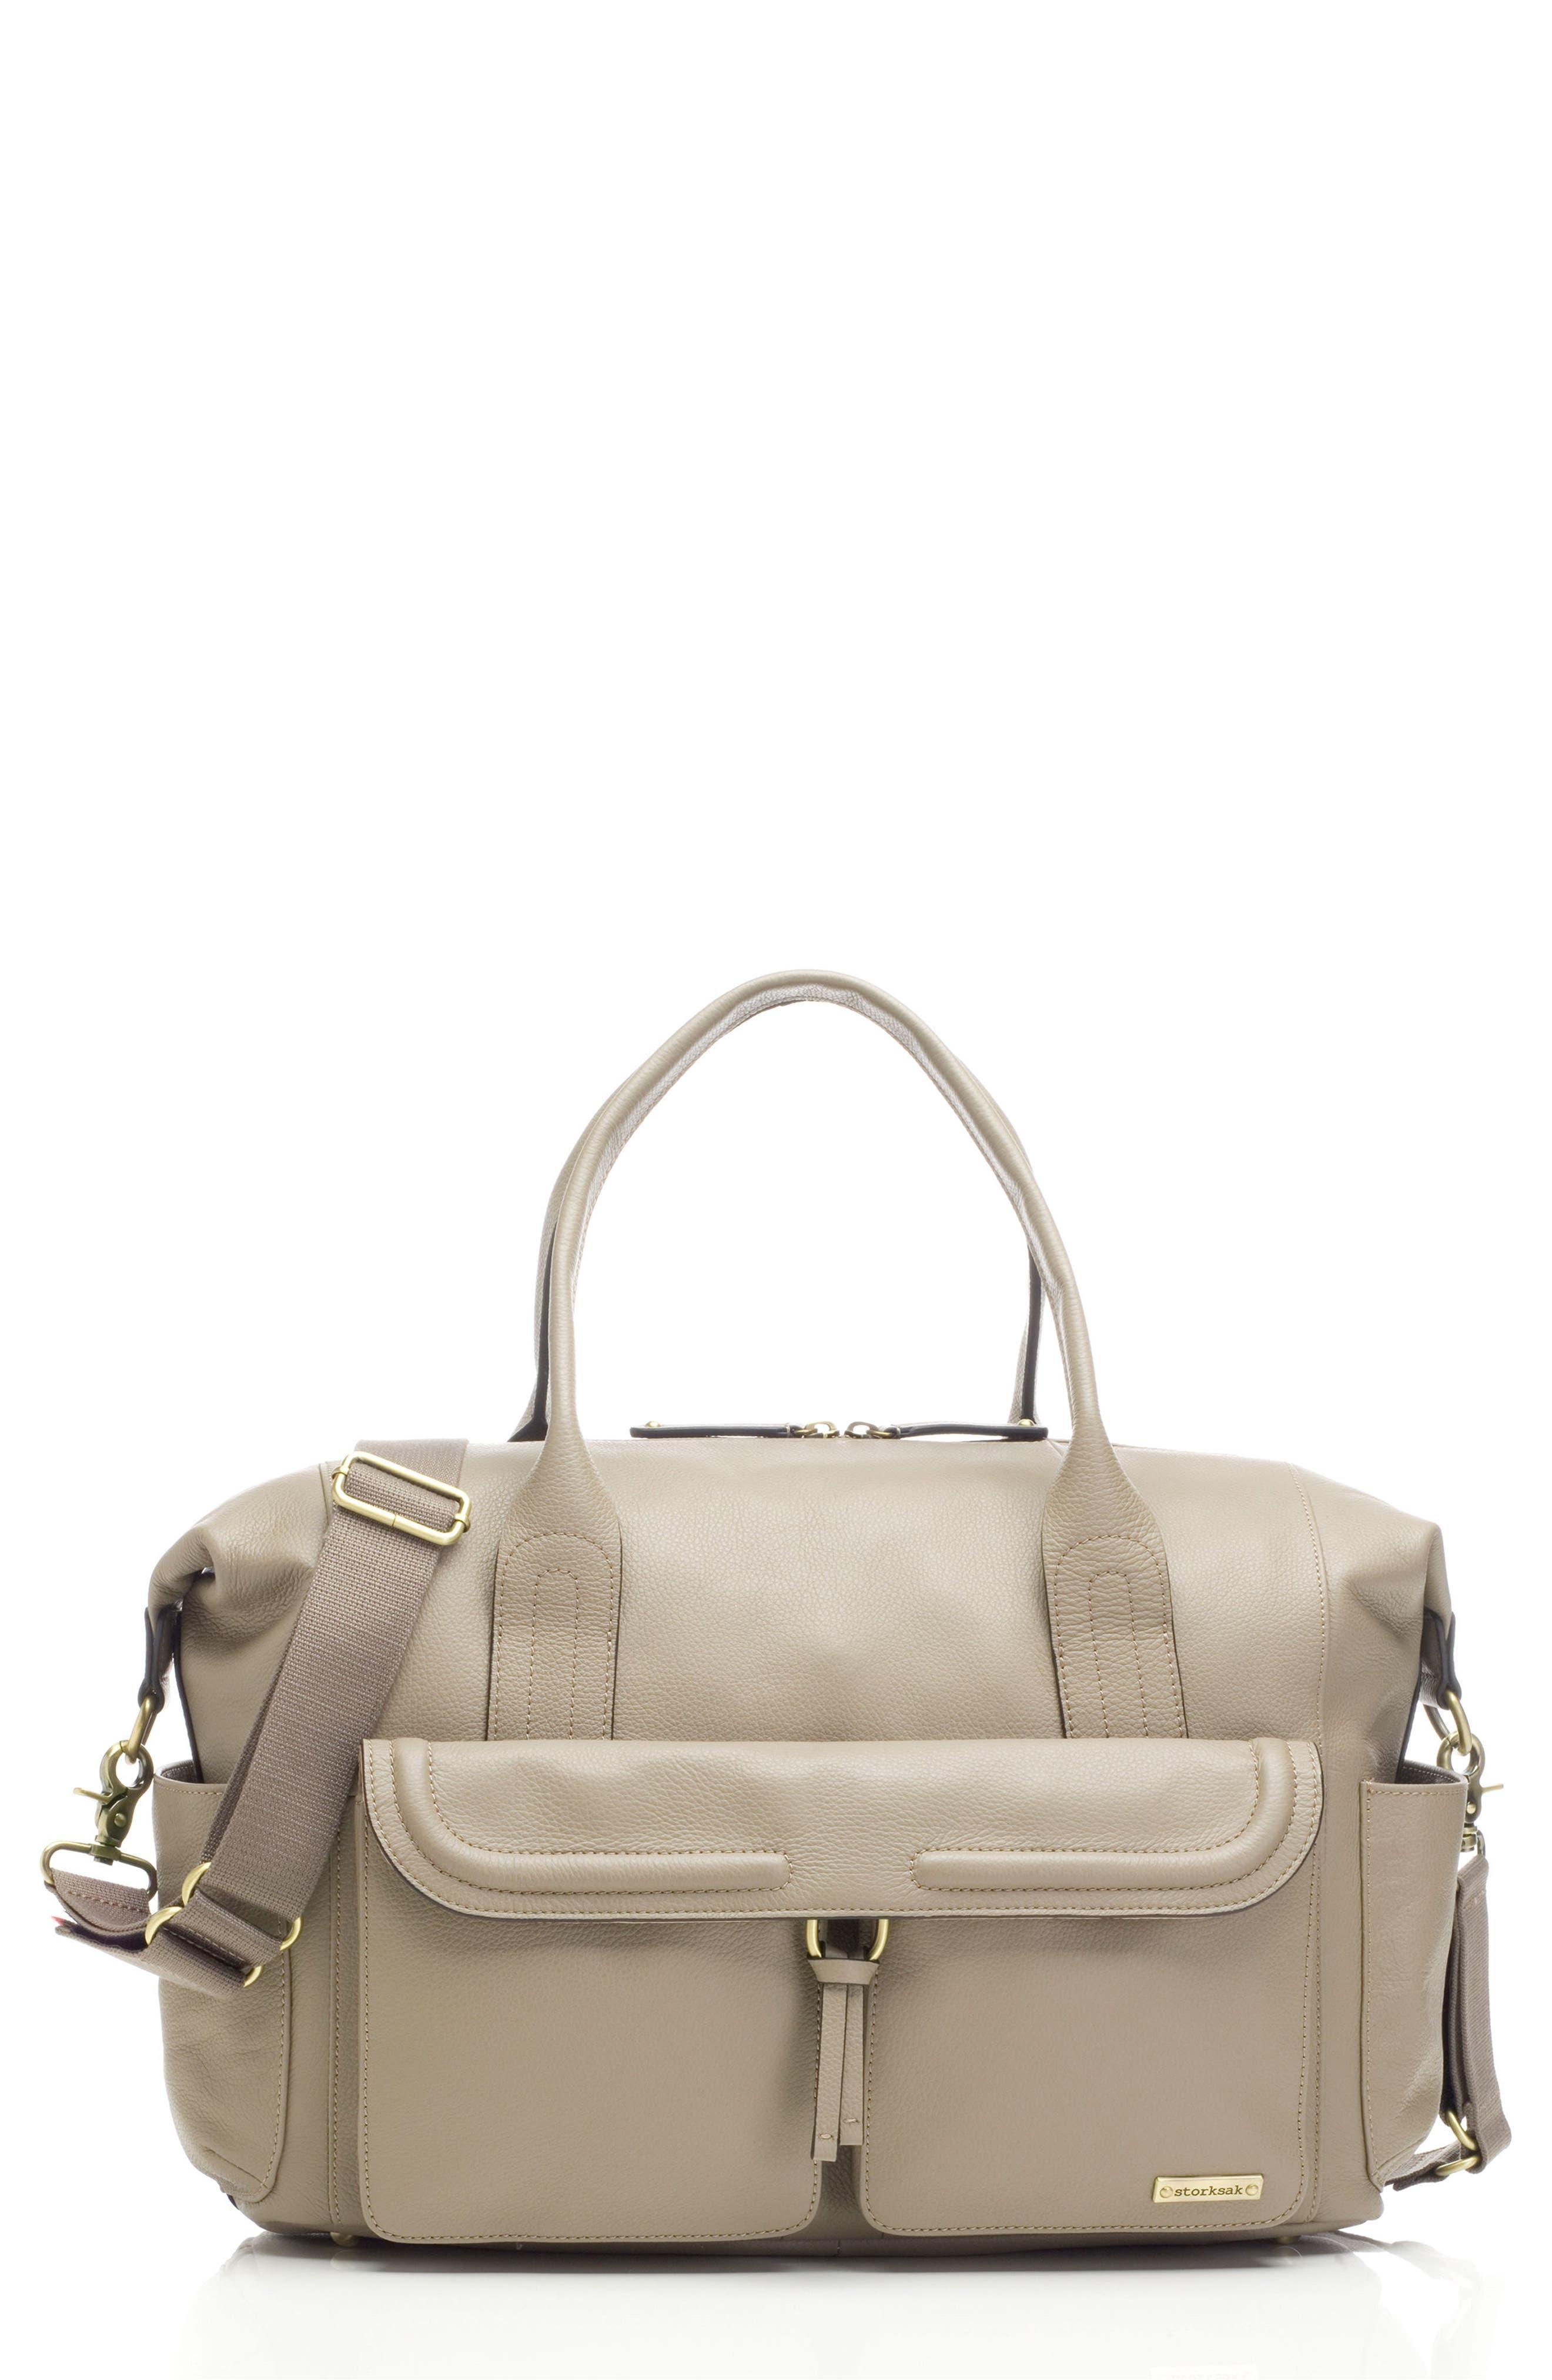 Alternate Image 1 Selected - Storsak Leather Diaper Bag